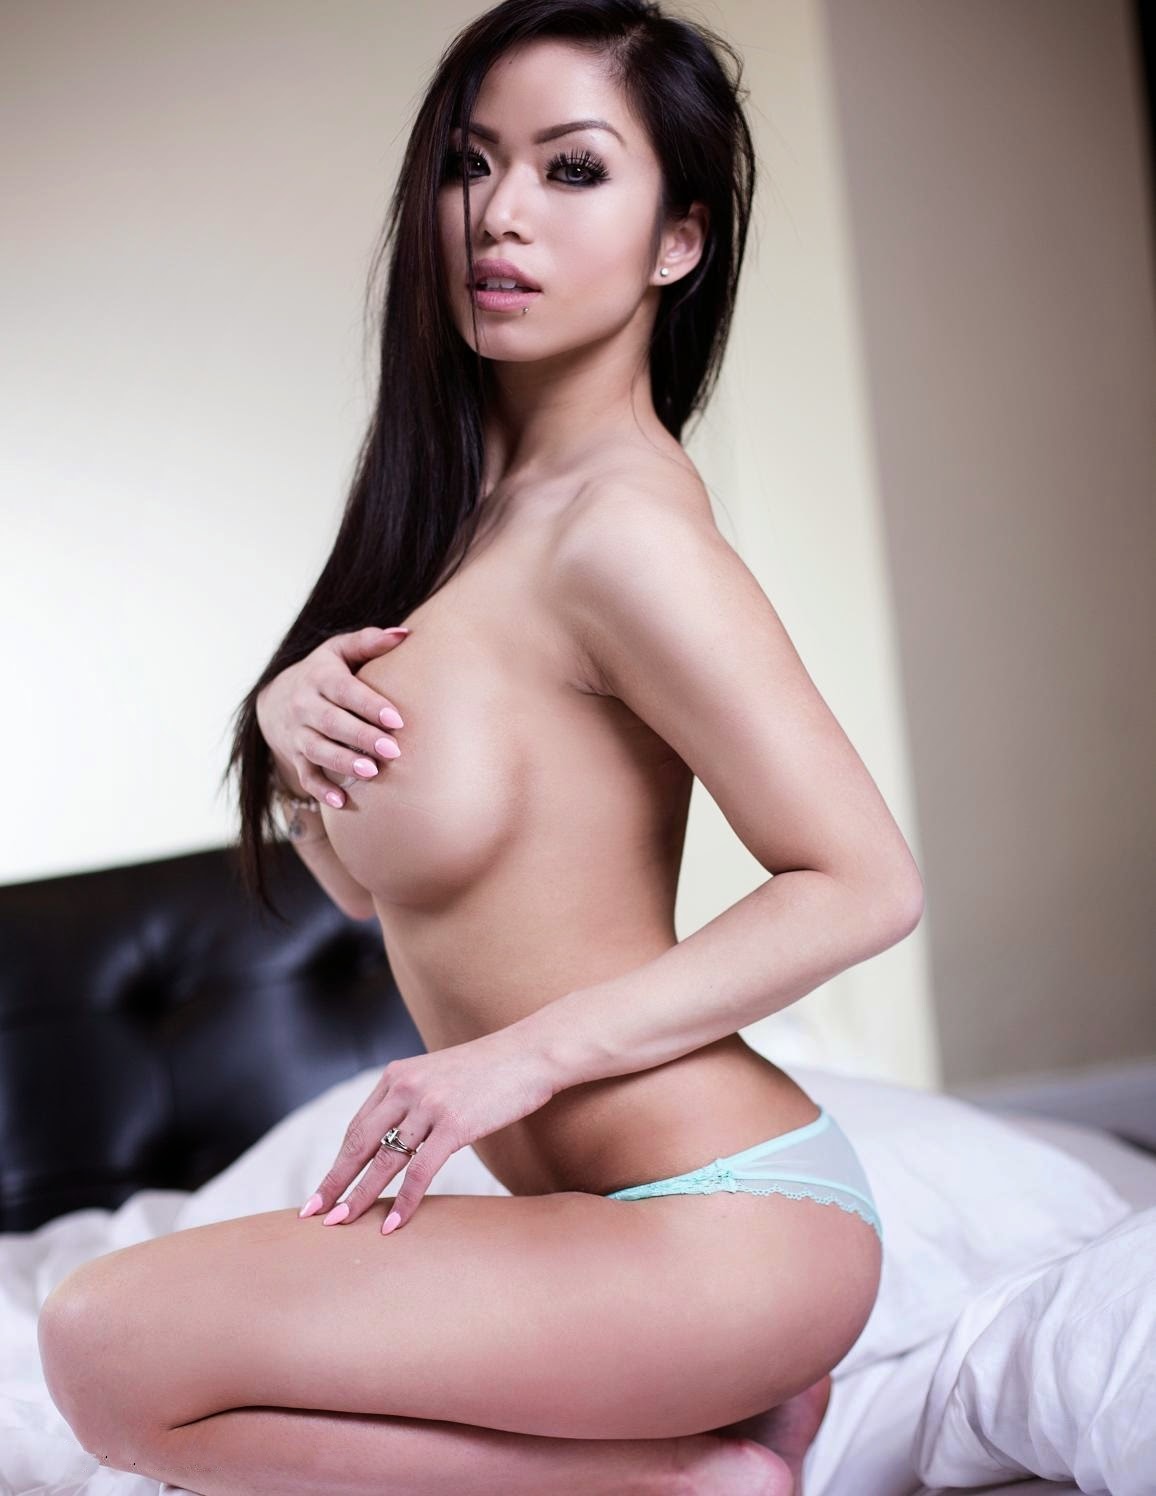 donna pham sexy naked pics 03